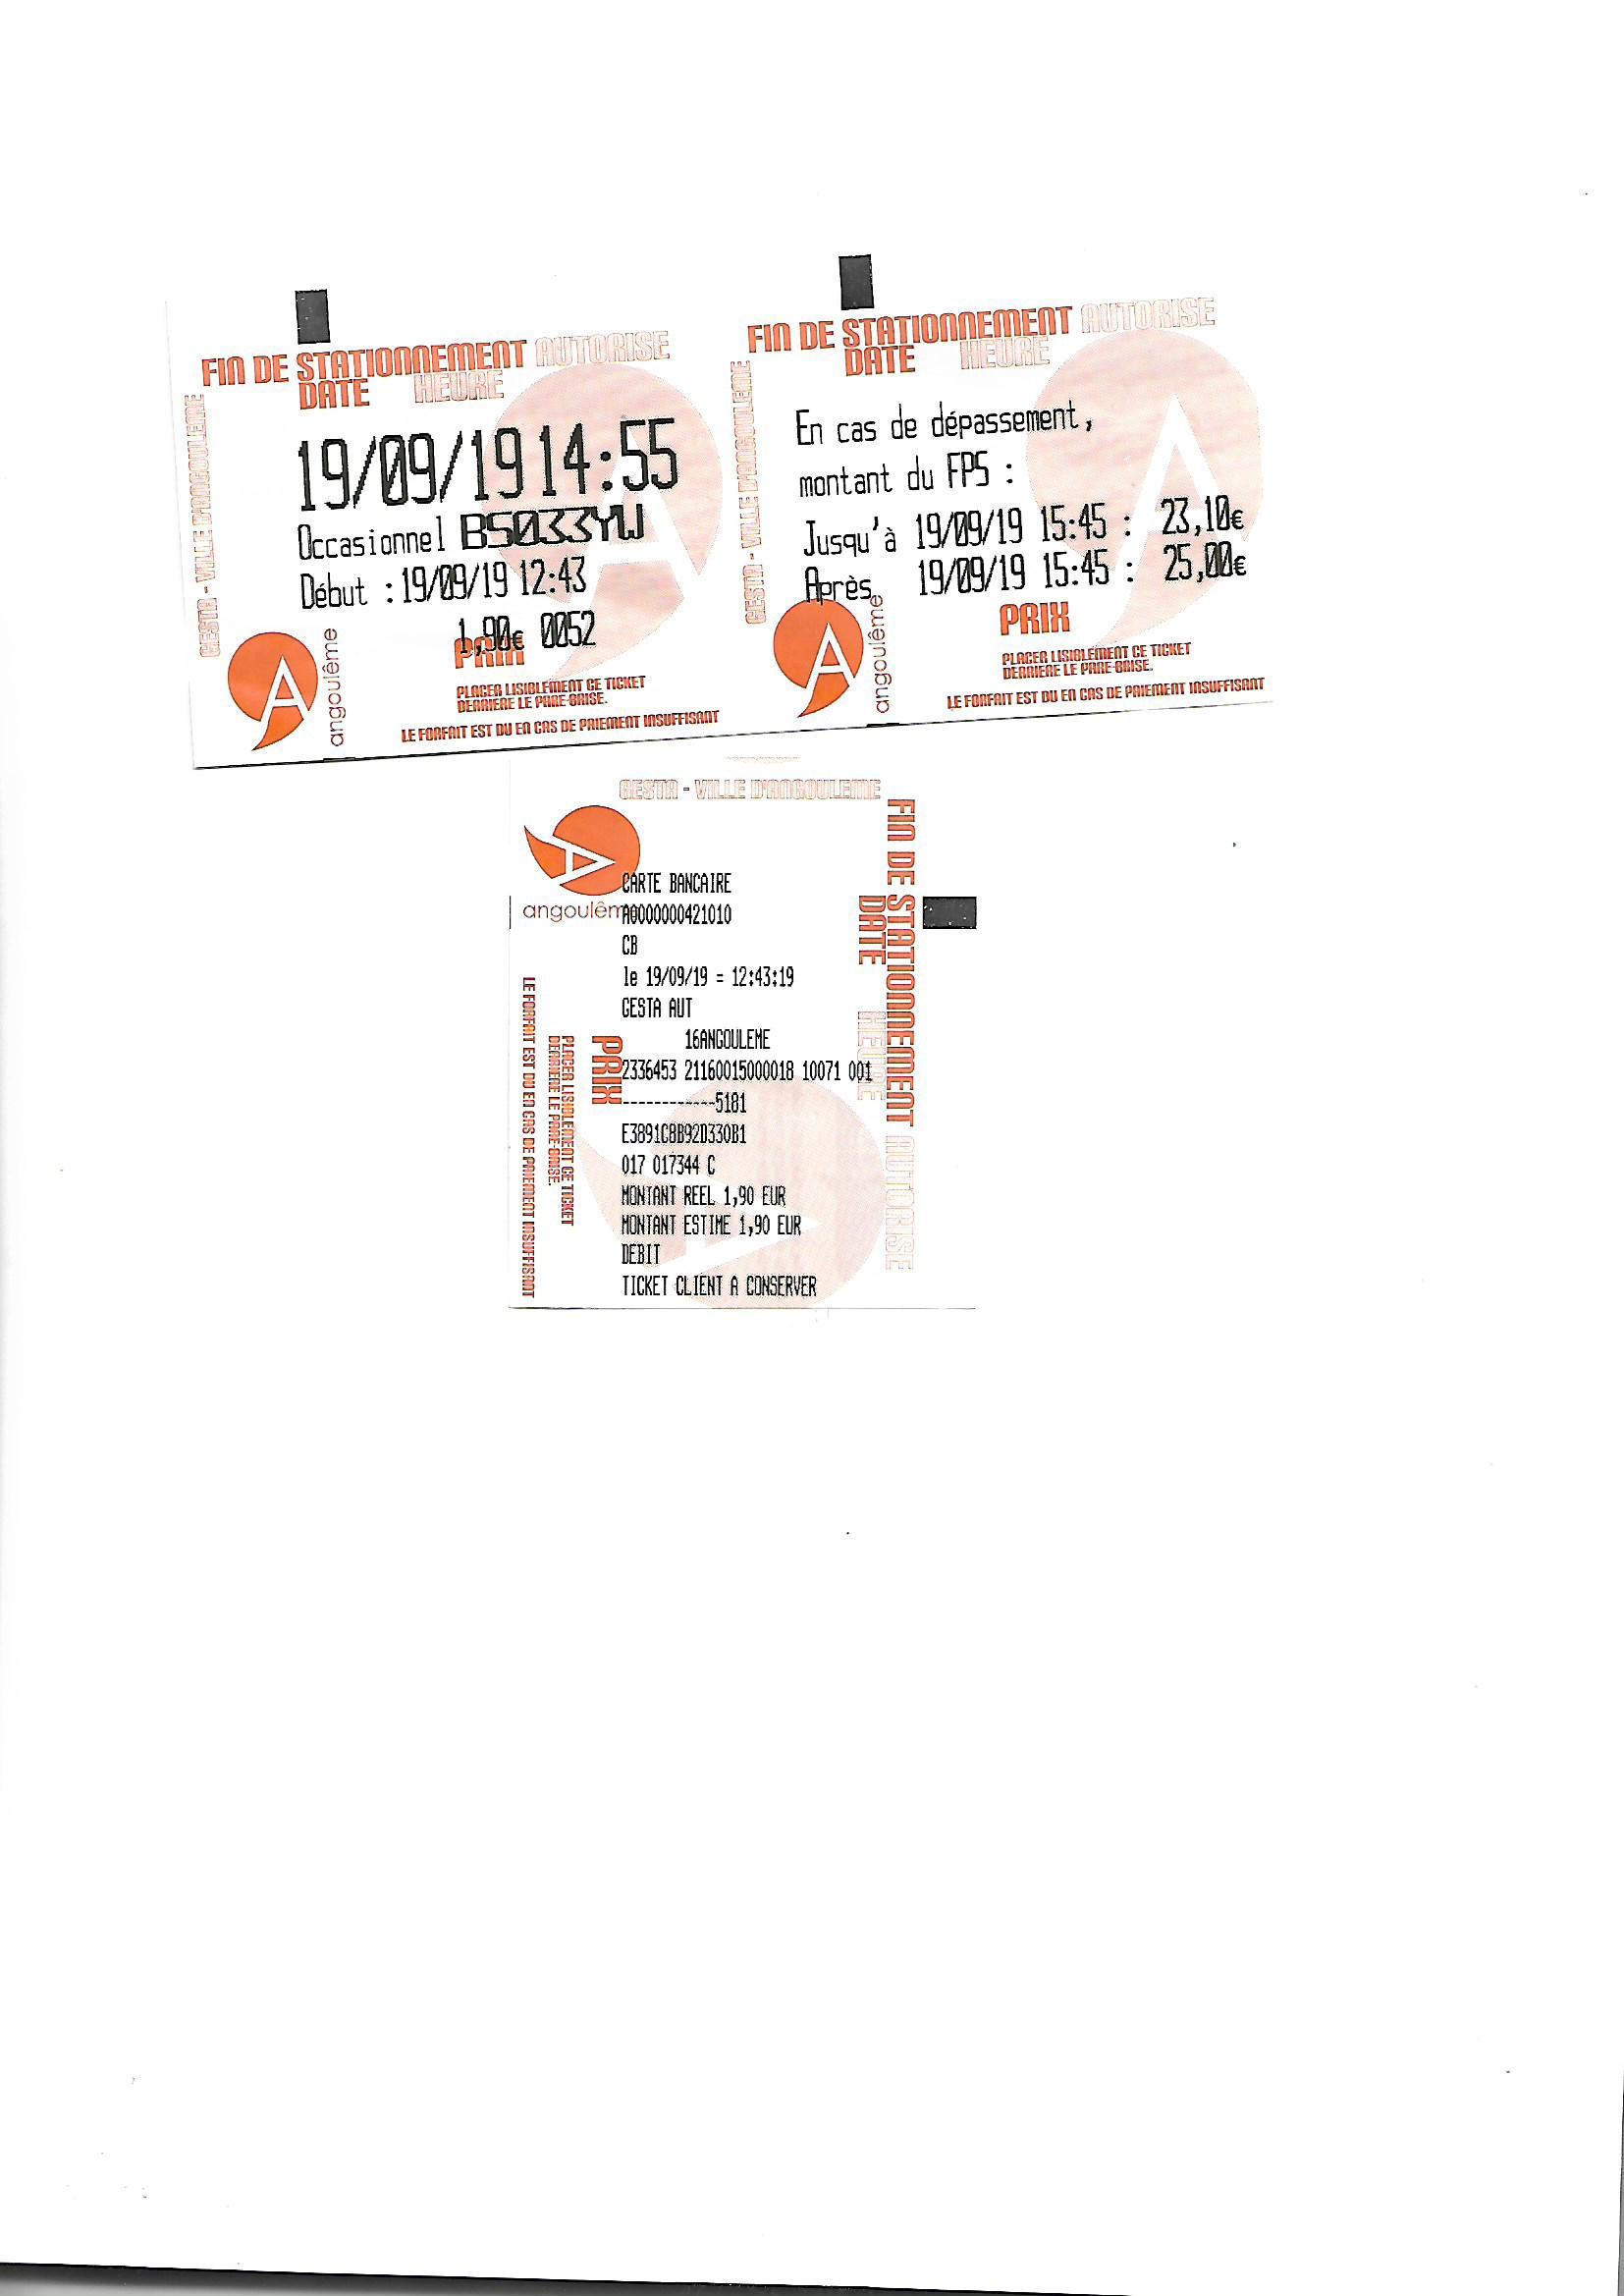 Tickets stationnement Angoulême le 19.09.2019